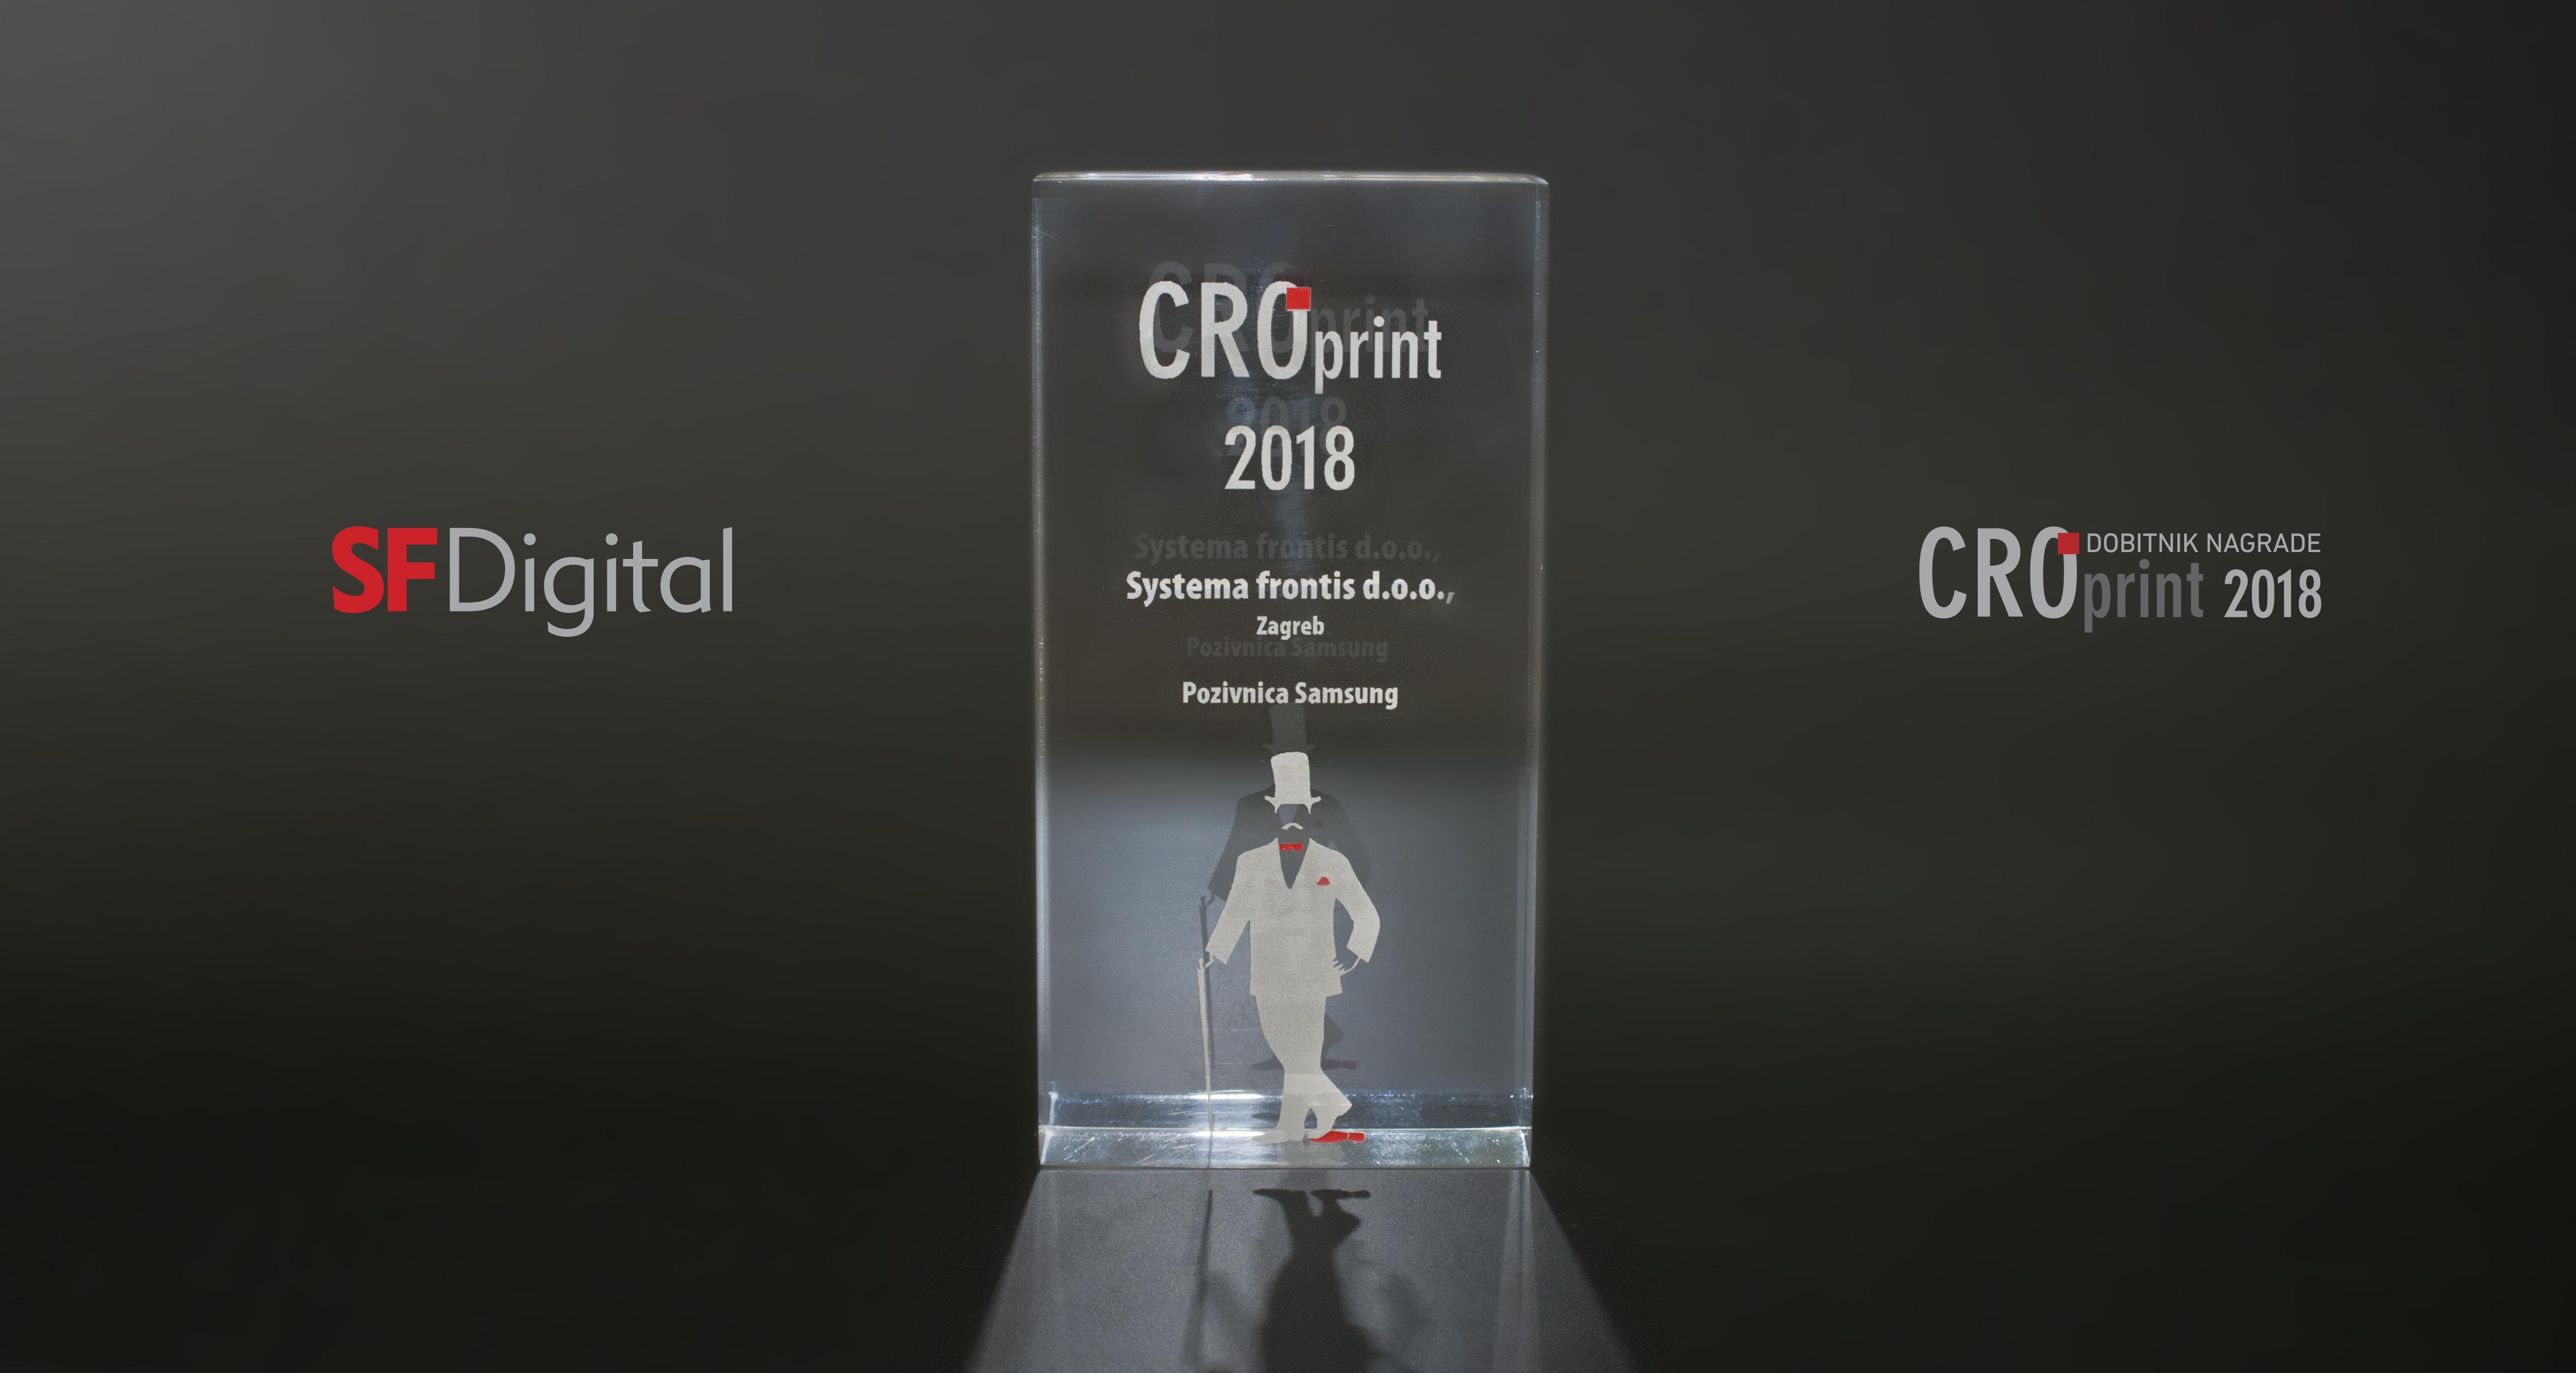 DOBITNIK NAGRADE CRO PRINT 2018